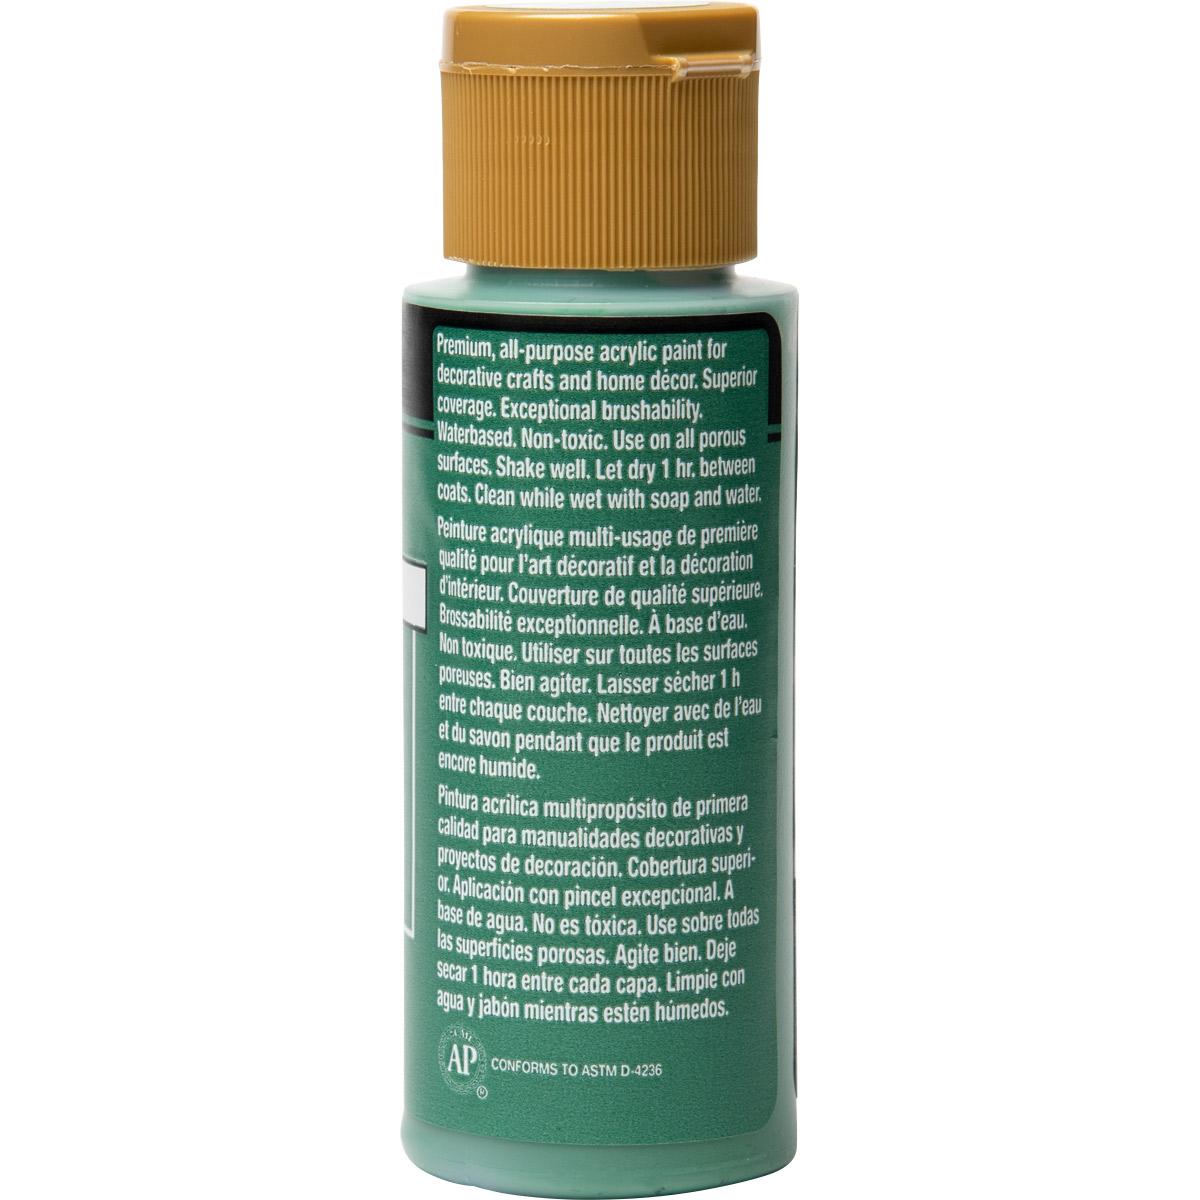 FolkArt ® Acrylic Colors - Smoky Jade, 2 oz. - 99256